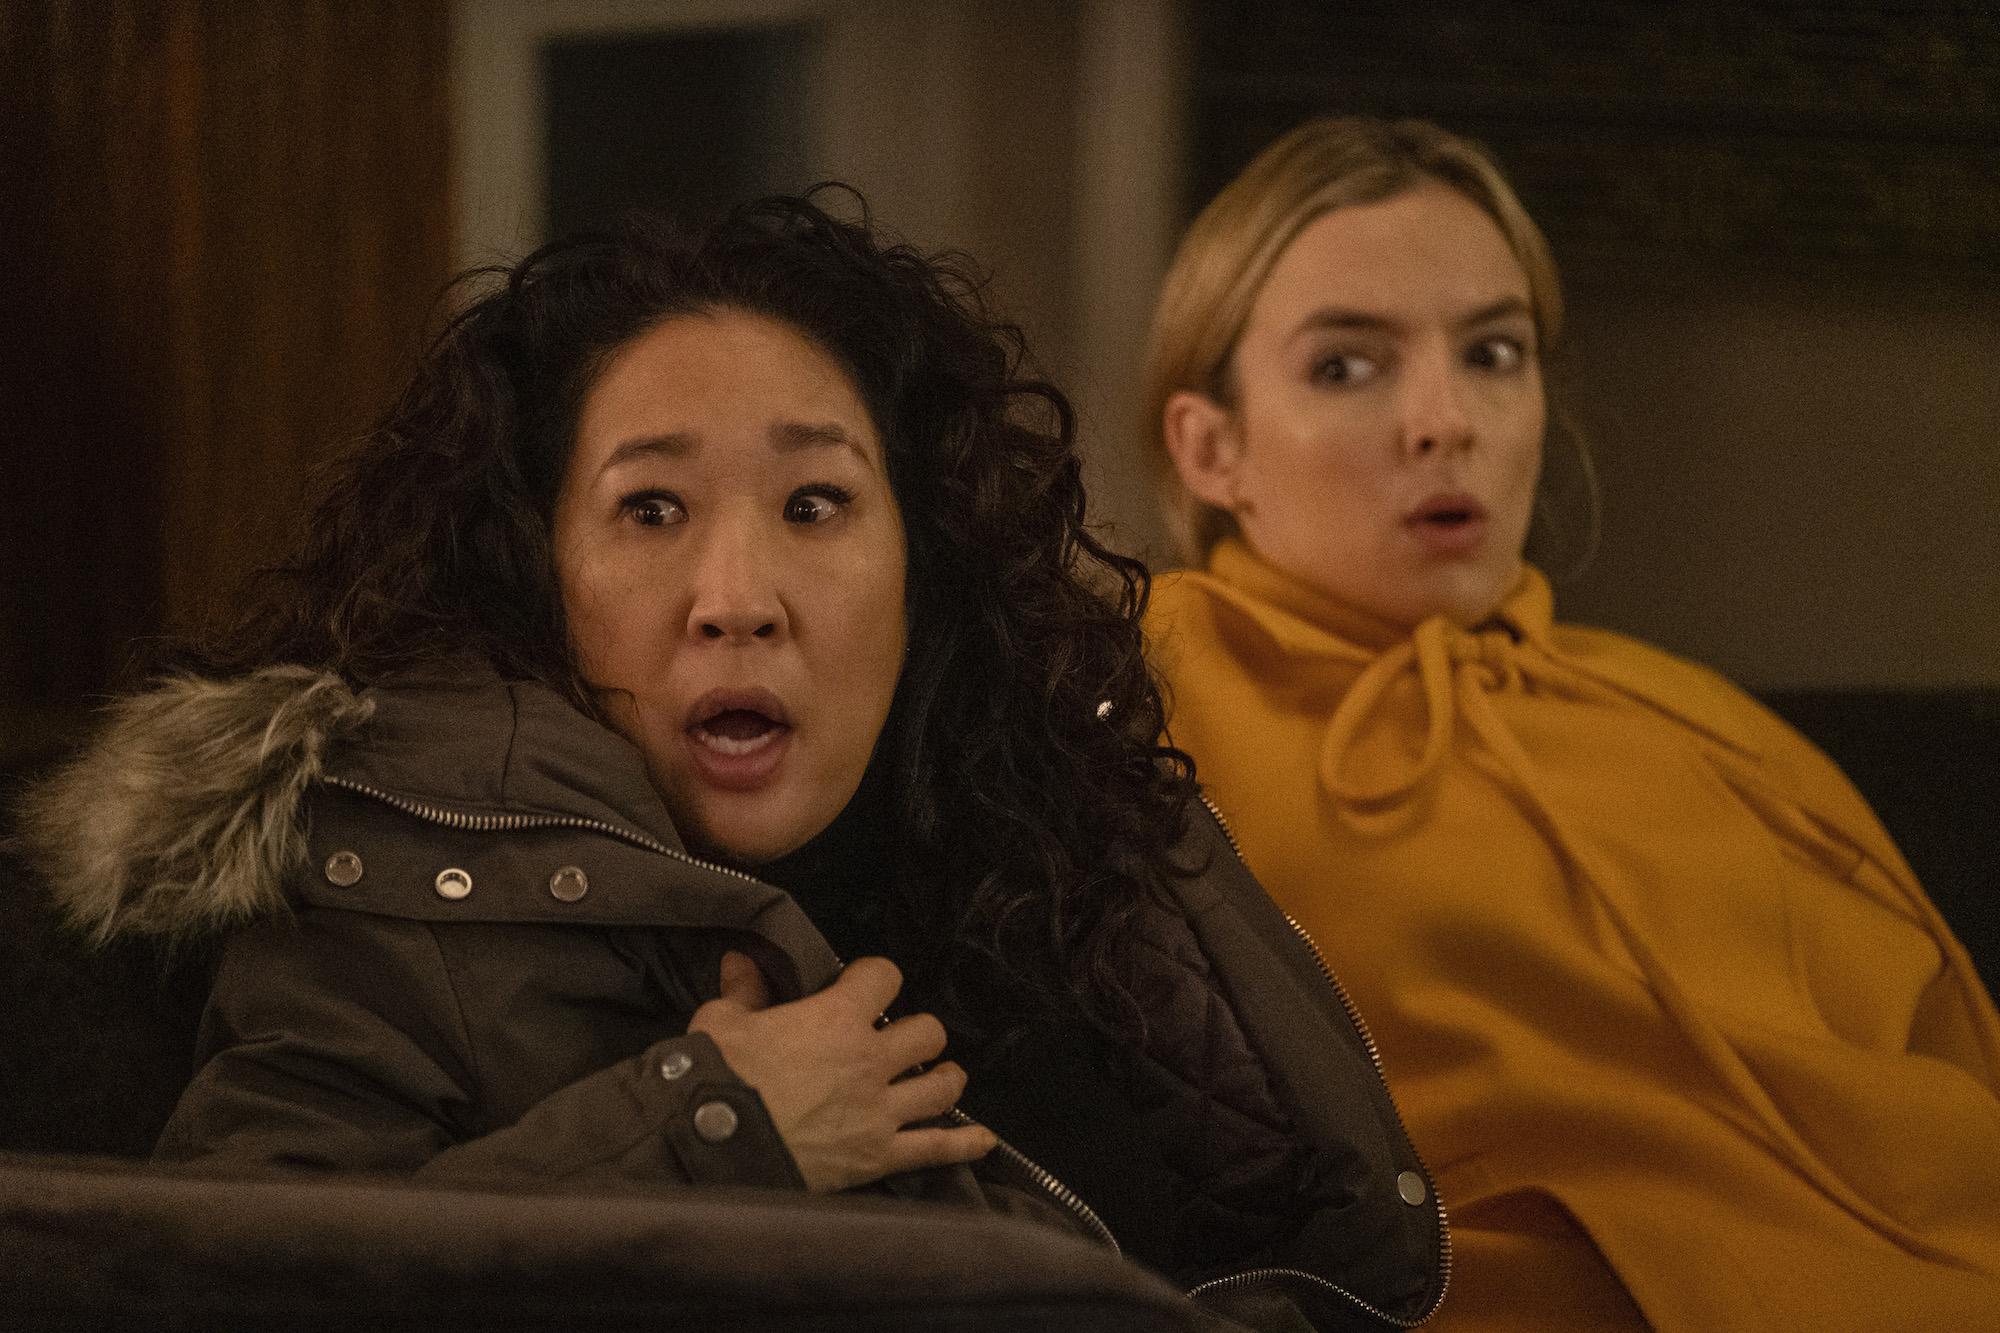 Sandra Oh as Eve Polastri, Jodie Comer as Villanelle - Killing Eve _ Season 3, Episode 8